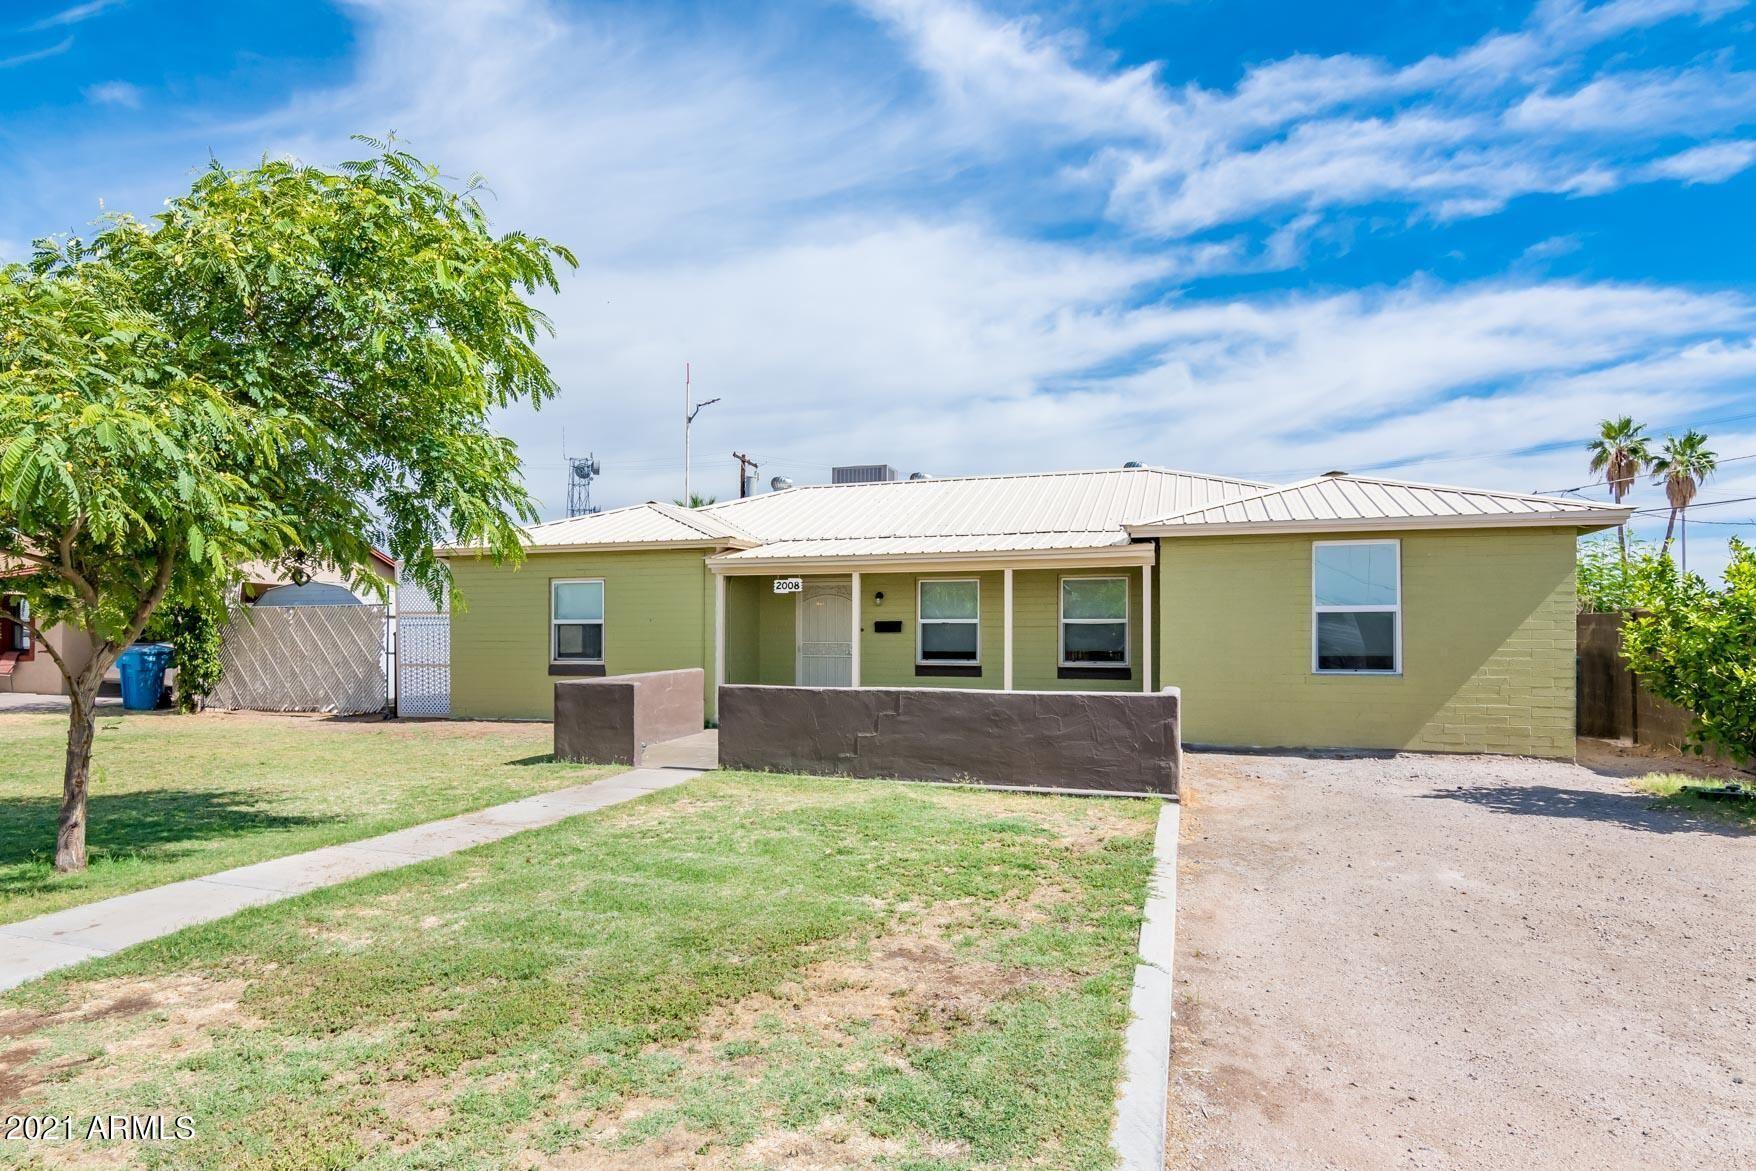 2008 W ALVARADO Road, Phoenix, AZ 85009 - MLS#: 6248927